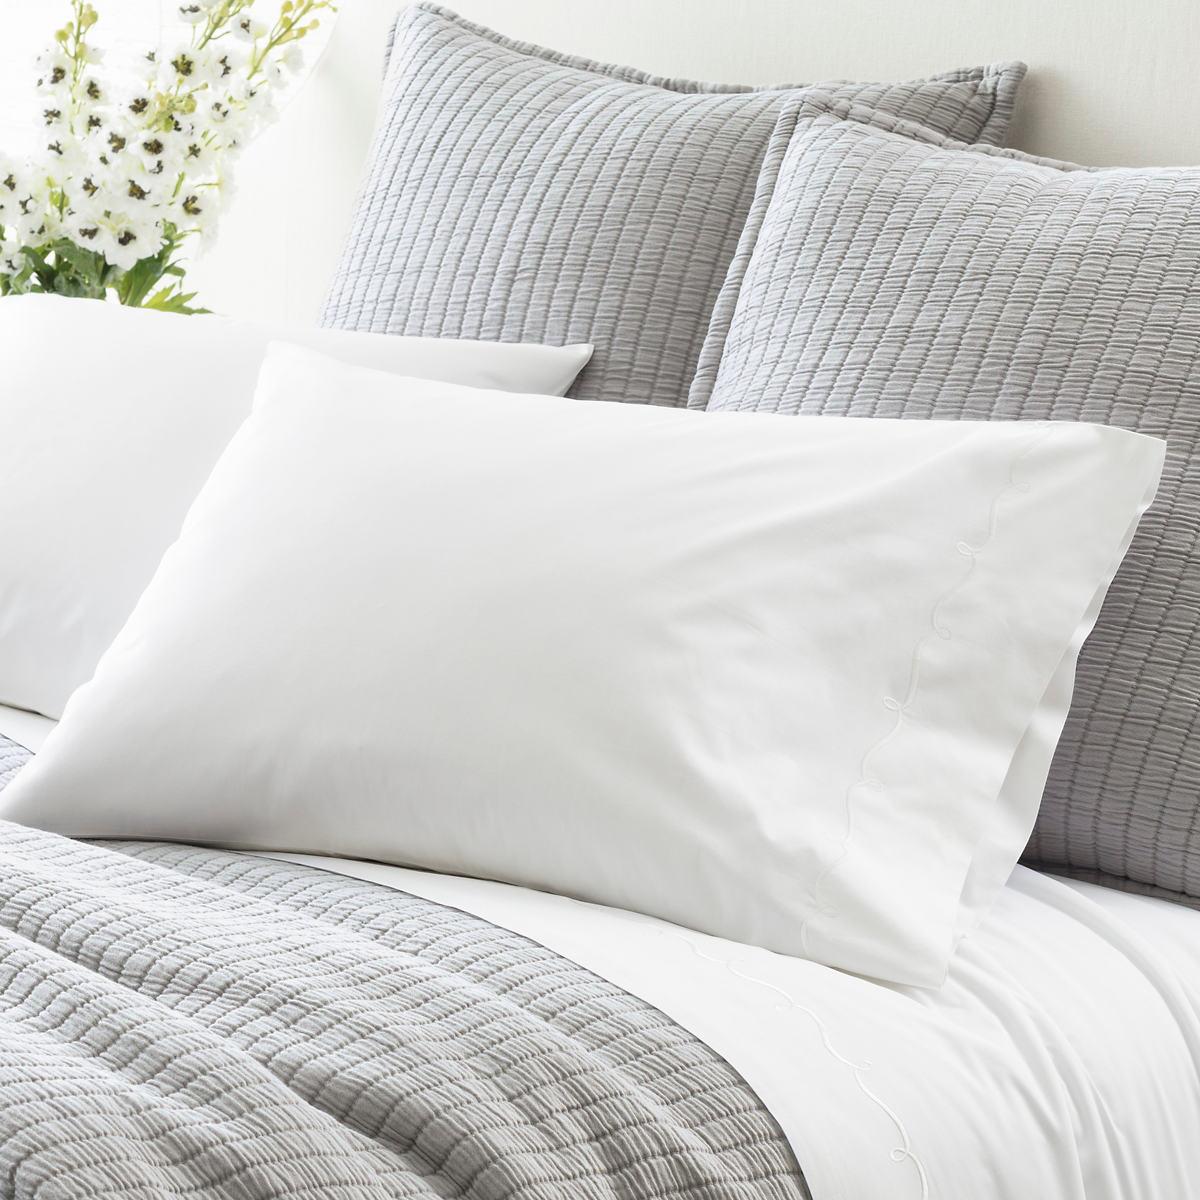 Embroidered Hem White/White Pillowcases